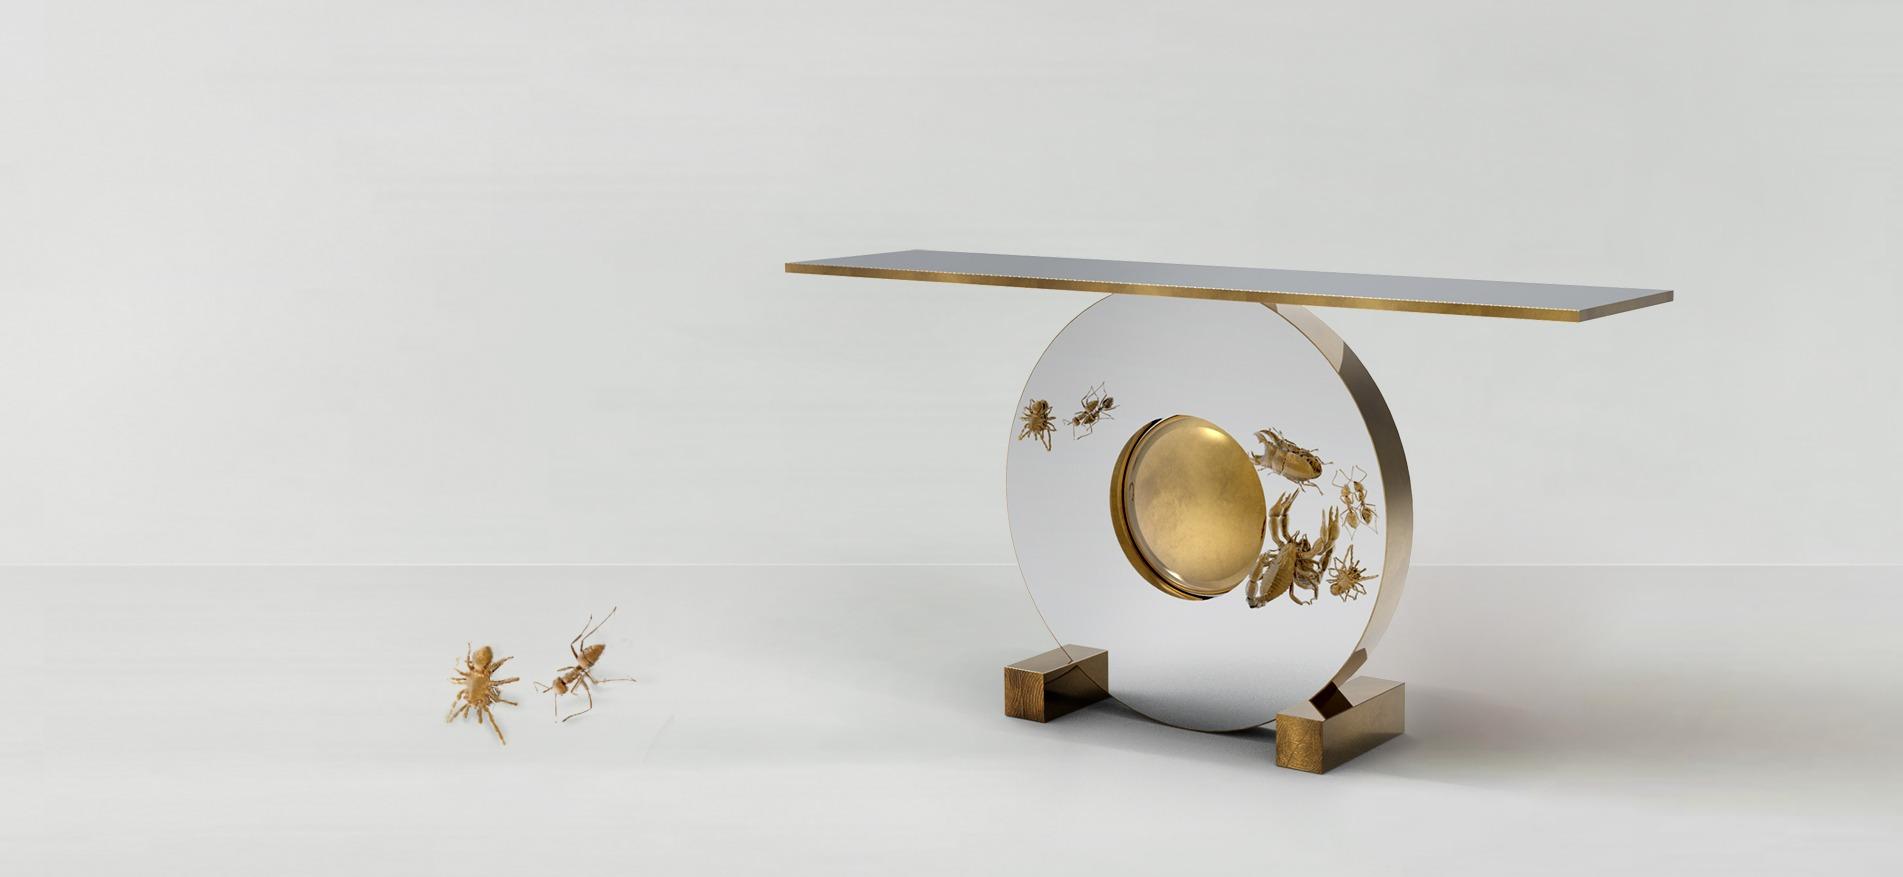 art furniture The Metamorphosis Collection: Art Furniture Filled With Wickedness The Metamorposis Collection Art Furniture Filled With Wickedness 3